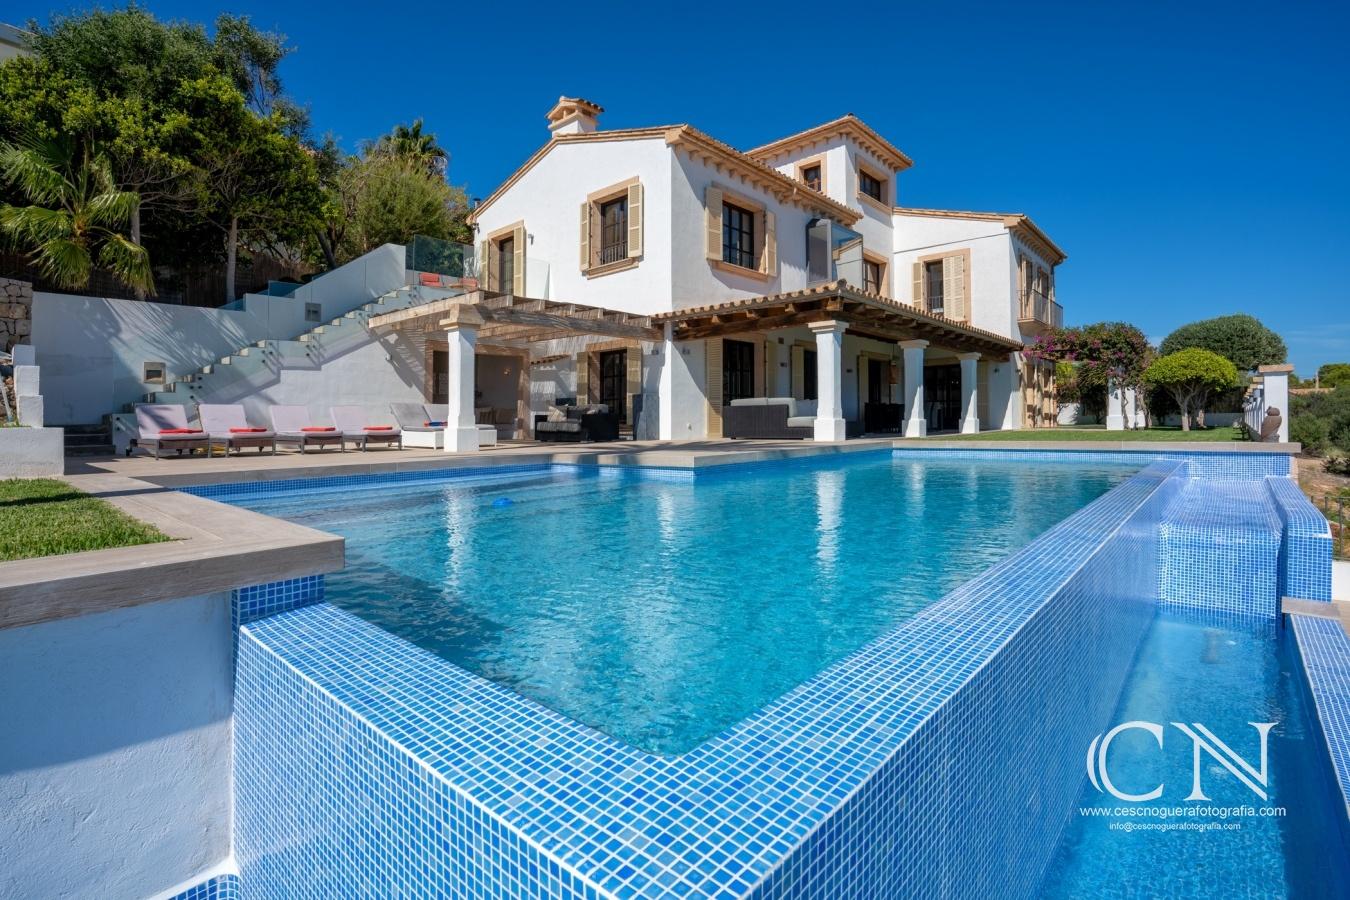 Finca al Port d'Andratx - Cesc Noguera Fotografia, Architectural & Interior design photographer / Landscape Photography